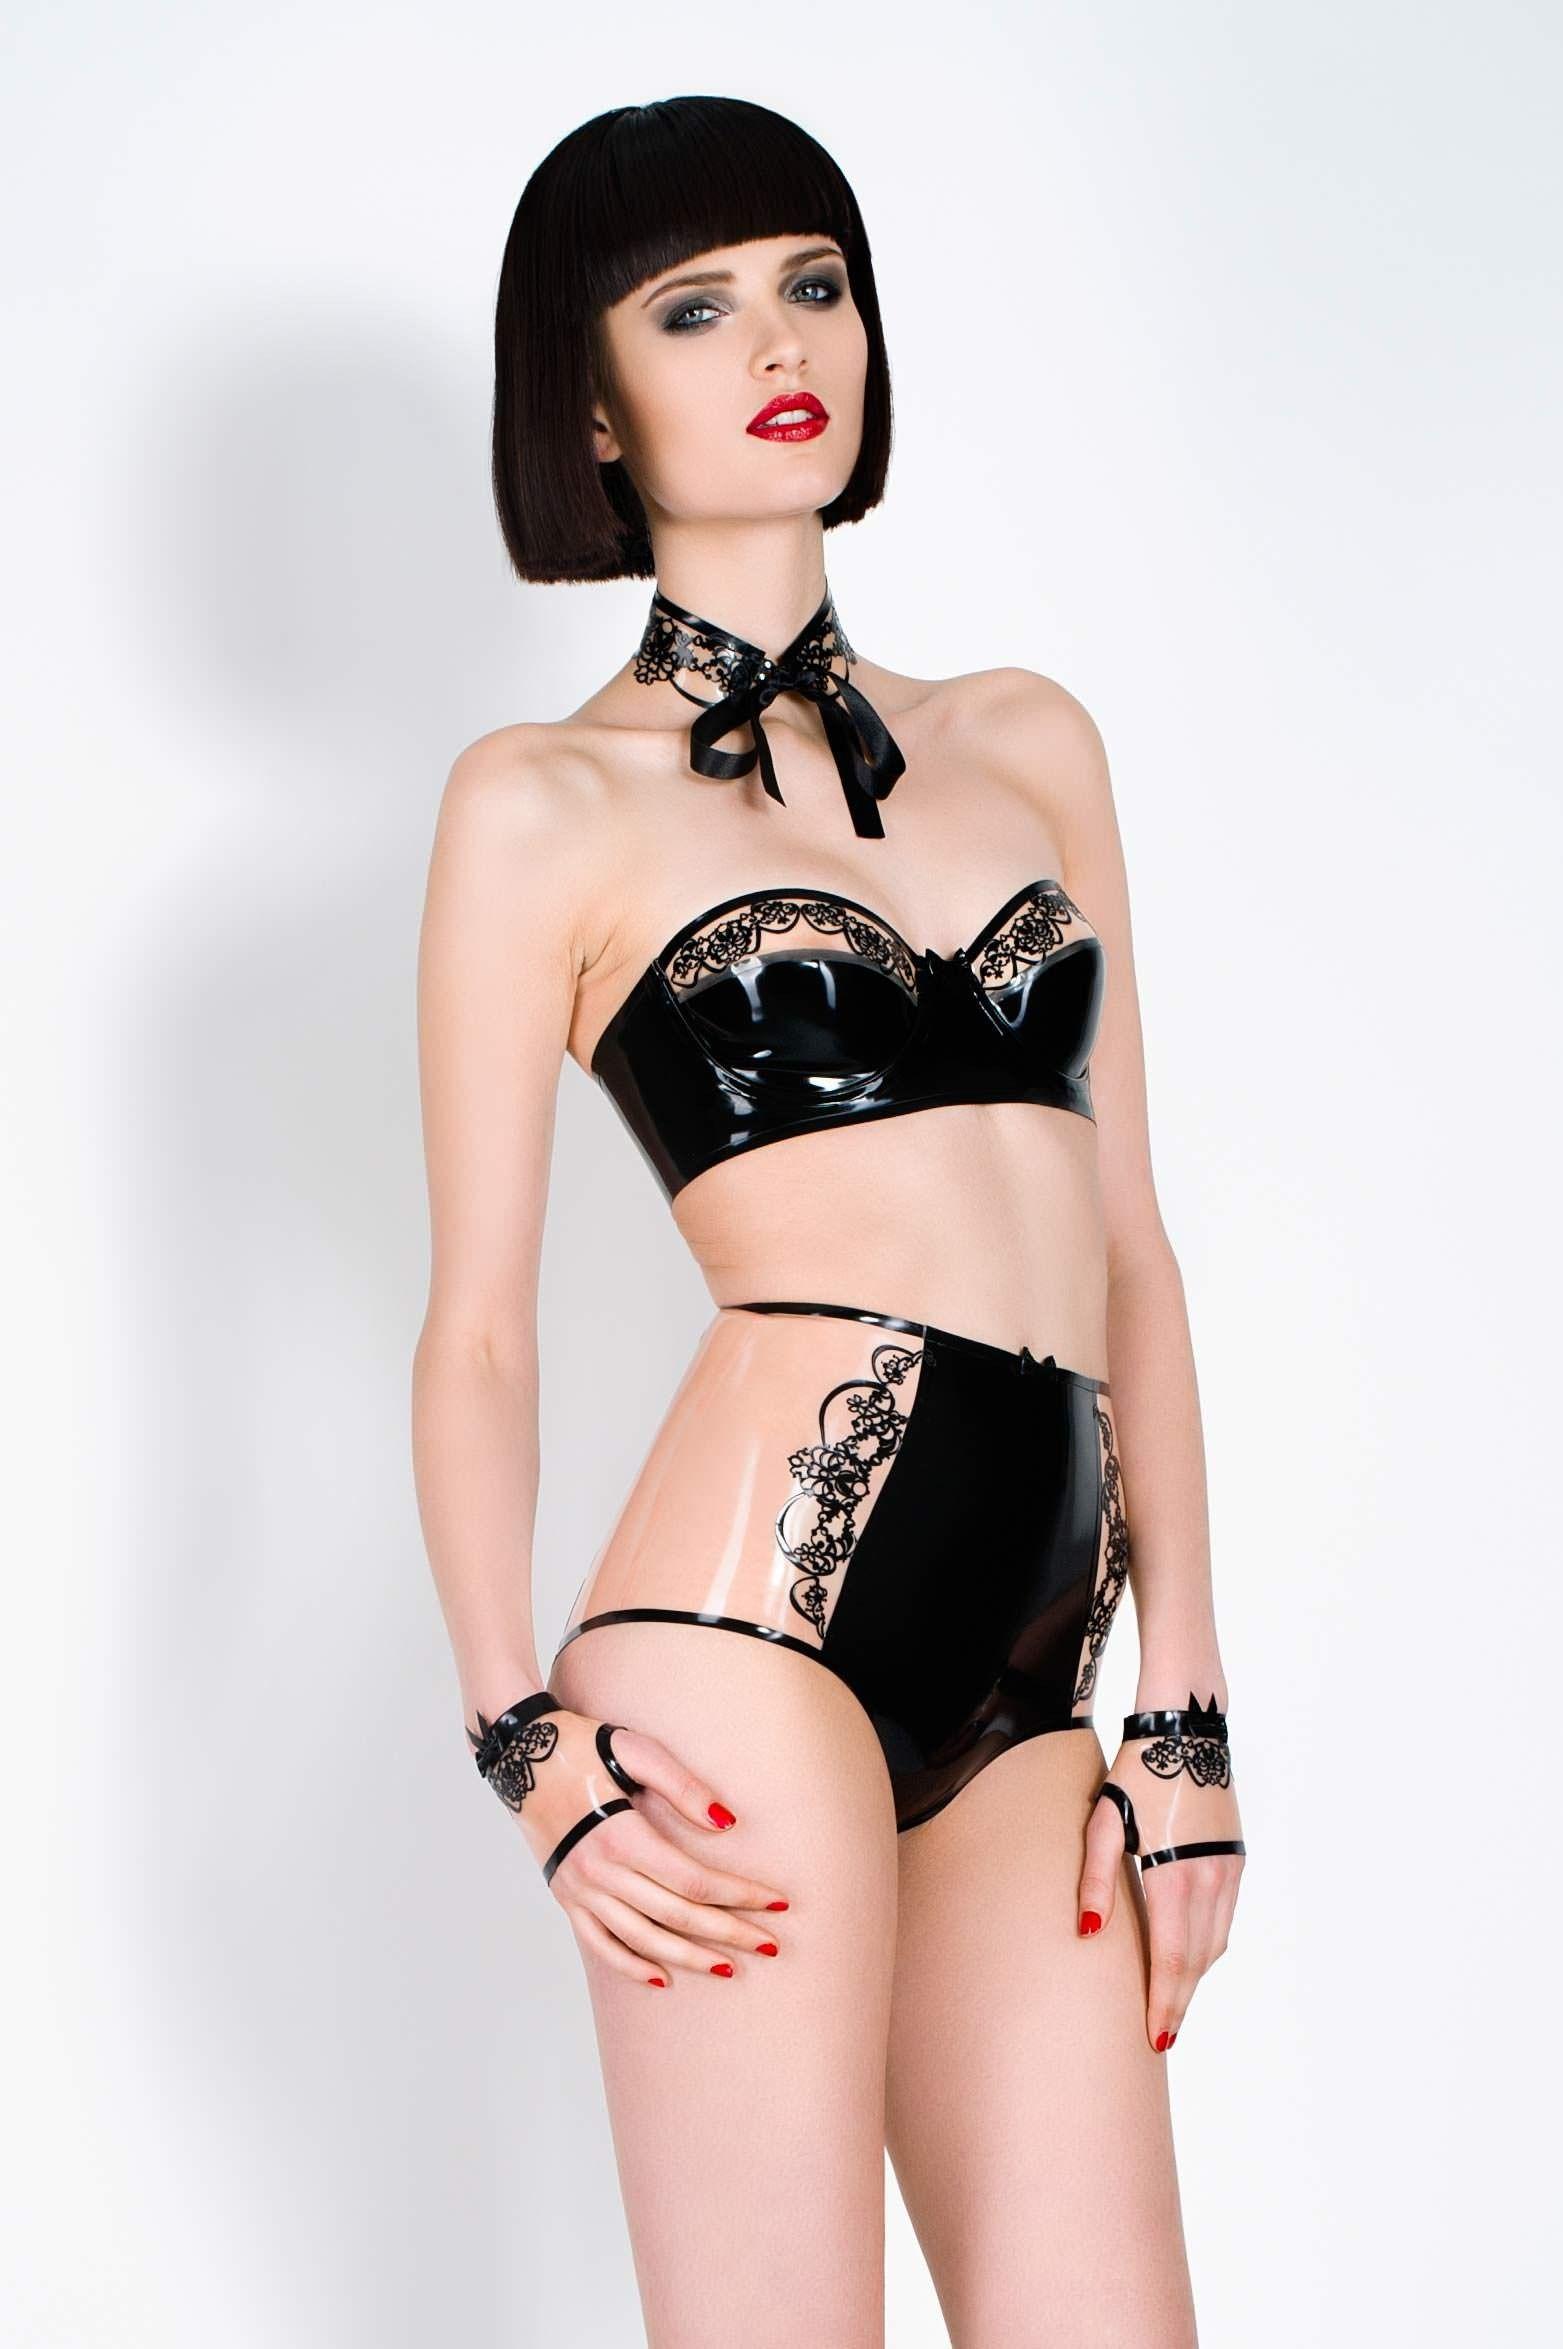 Pin By Jessica Marcotte On Fancy Scraps Latex Pinterest Korset Kim Waist Trainer S 5xl Size Lengkap Sexy Corset Fashion Women Lingerie Leather